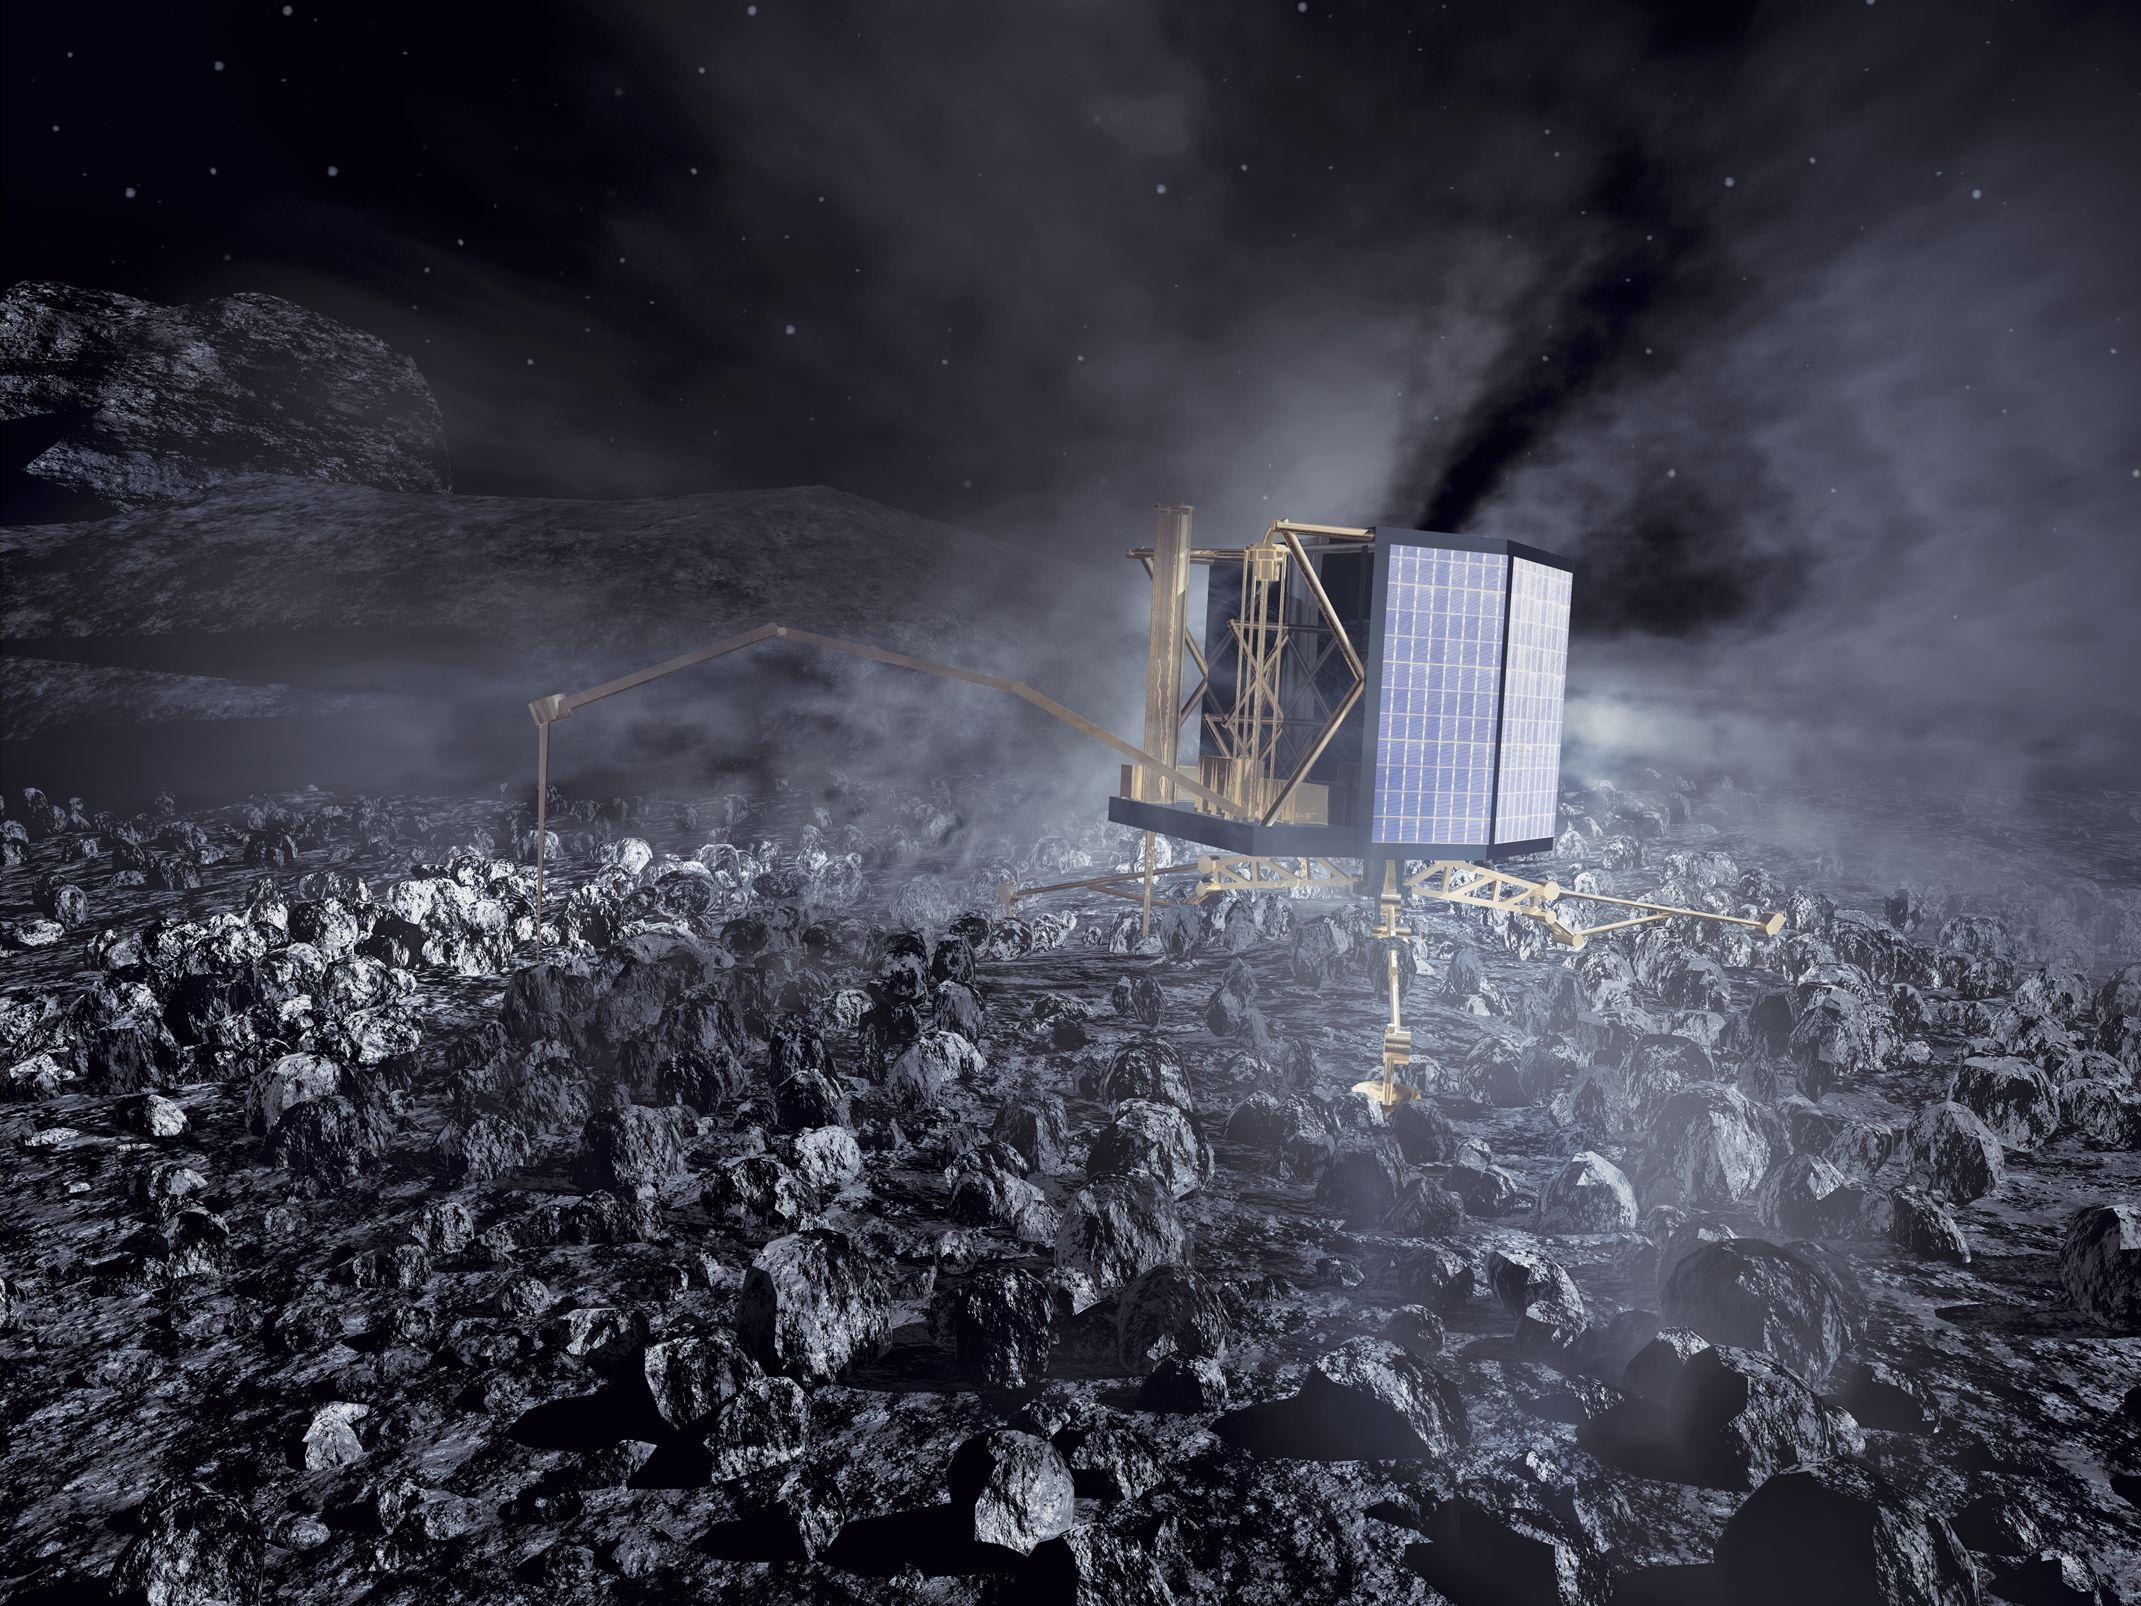 Space in Images - 2002 - 02 - Rosetta's Philae lander on ...